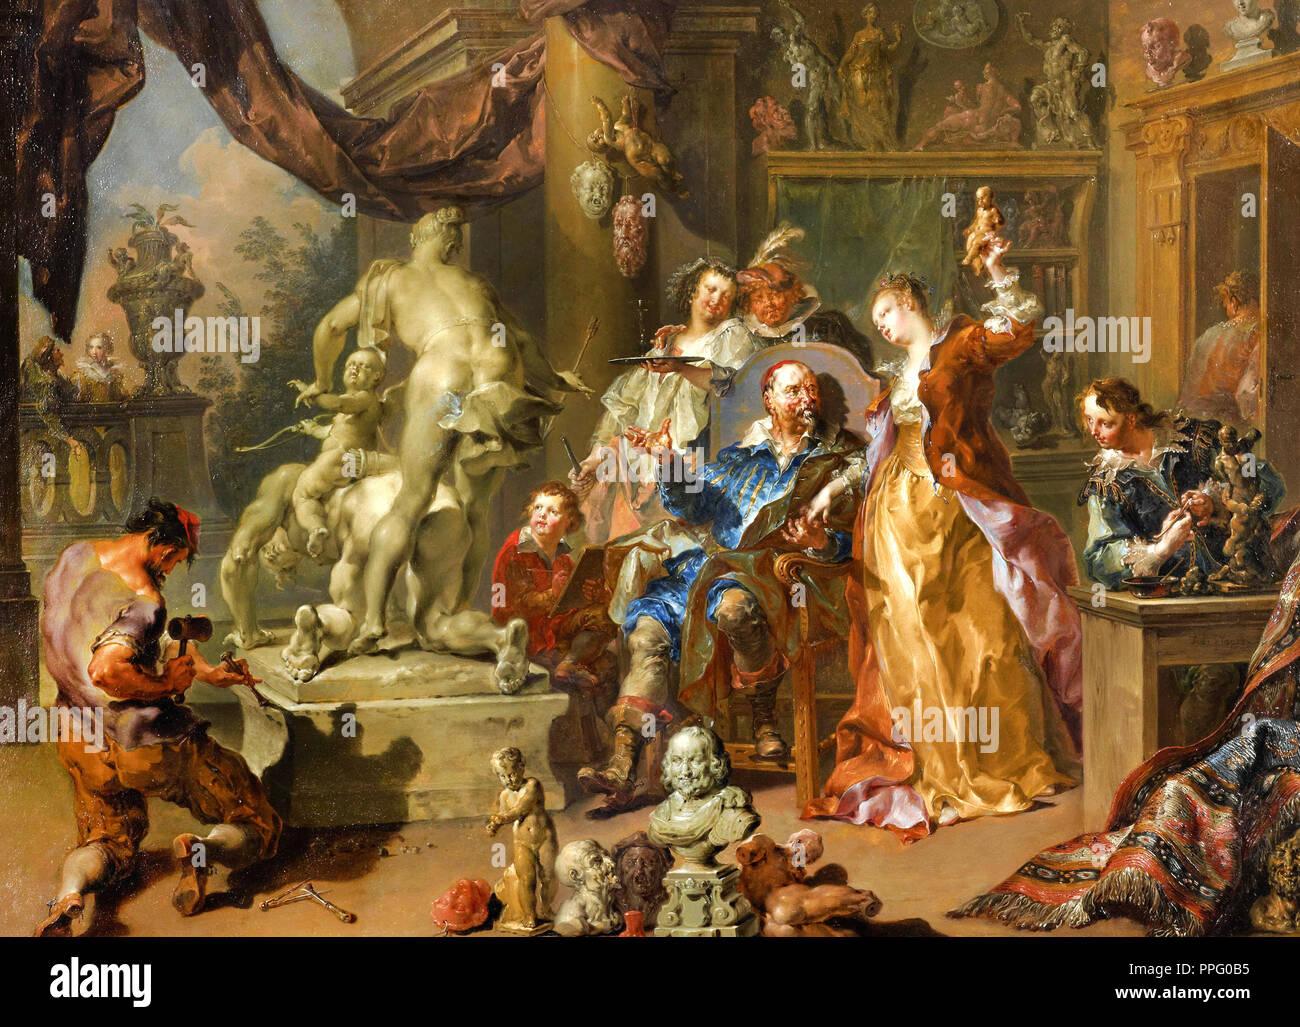 Johann Platzer - The Sculptor's Studio. 1730 Oil on copper. Art Gallery of New South Wales, Australia. - Stock Image